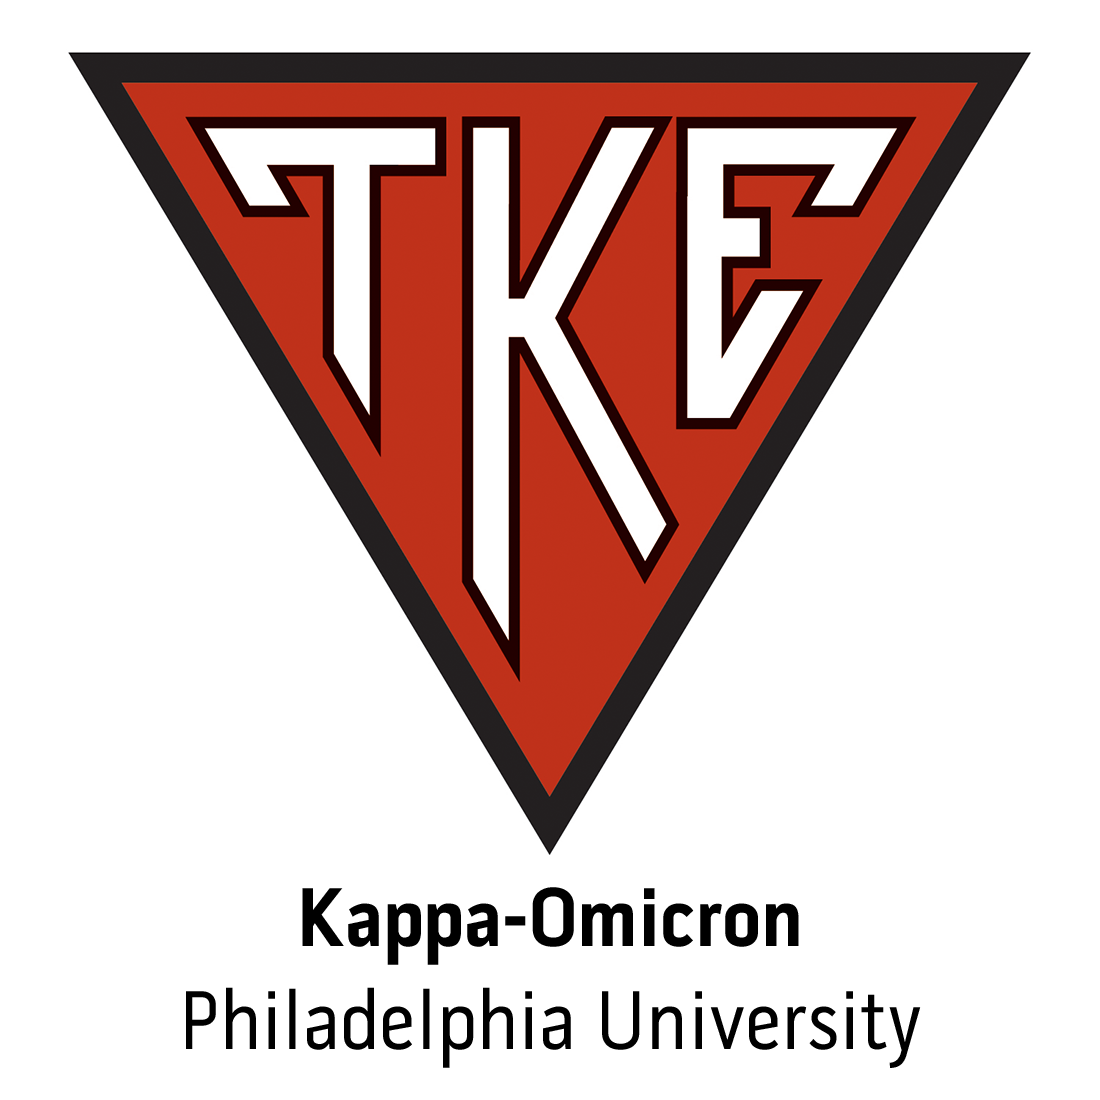 Kappa-Omicron Chapter at Philadelphia University